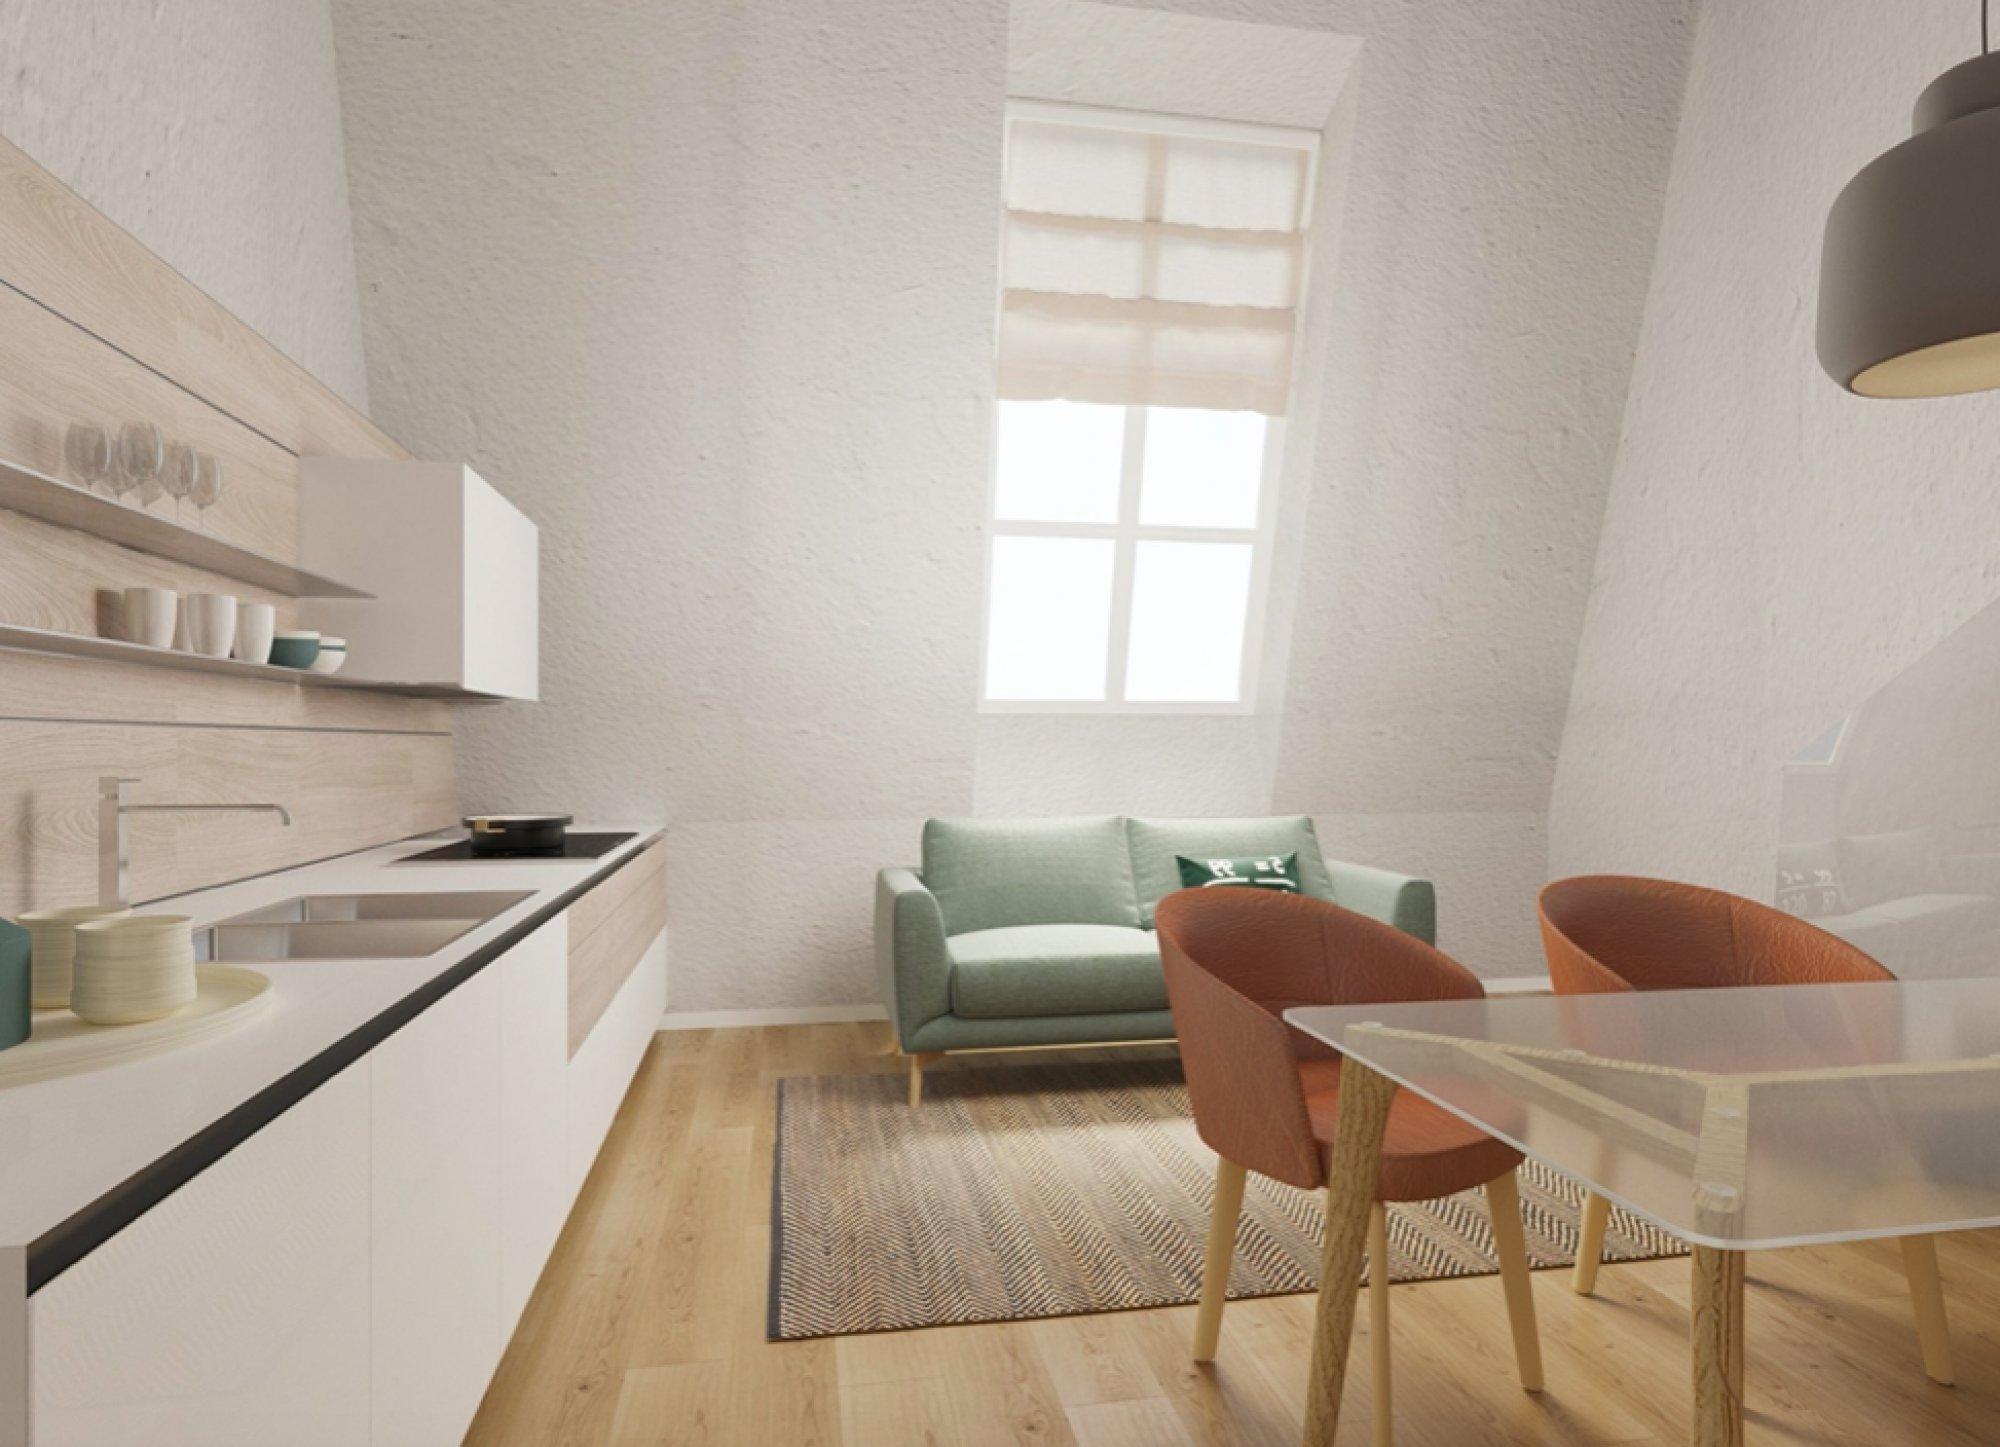 Půdní byt 2+kk, plocha 53 m², ulice Seifertova, Praha 3 - Žižkov | 2